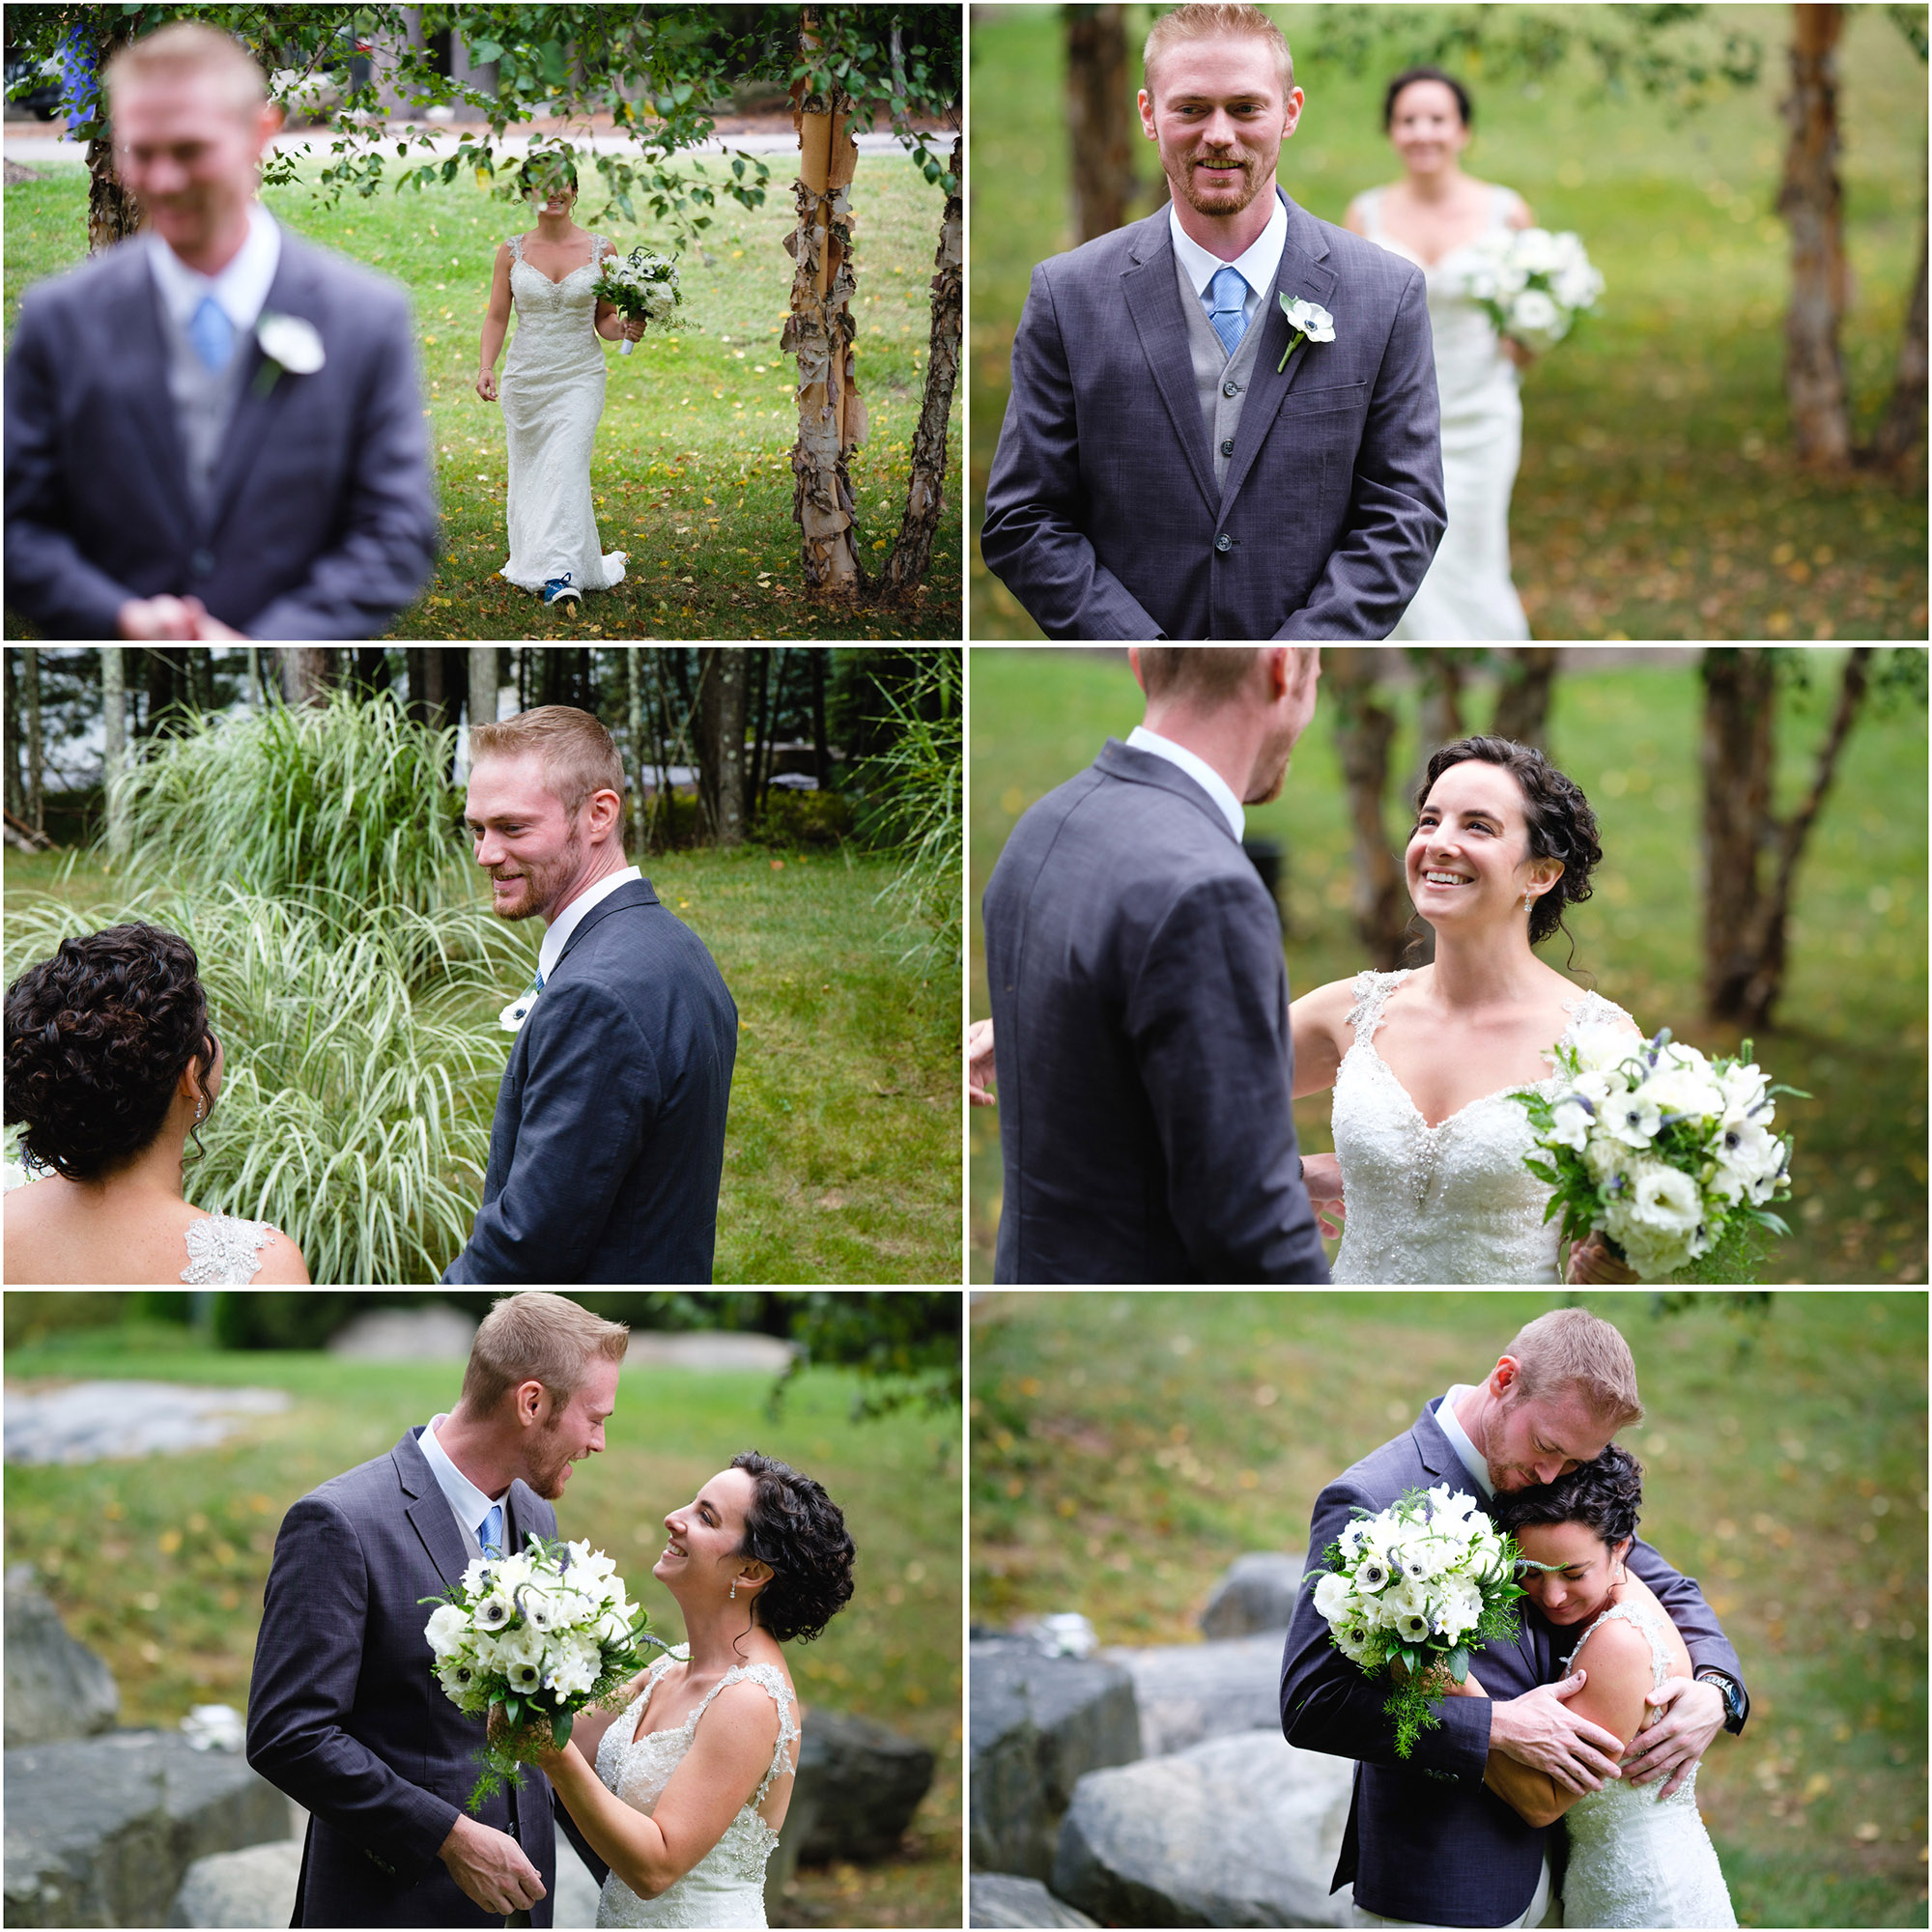 chris-jessie-woodloch-wedding-022